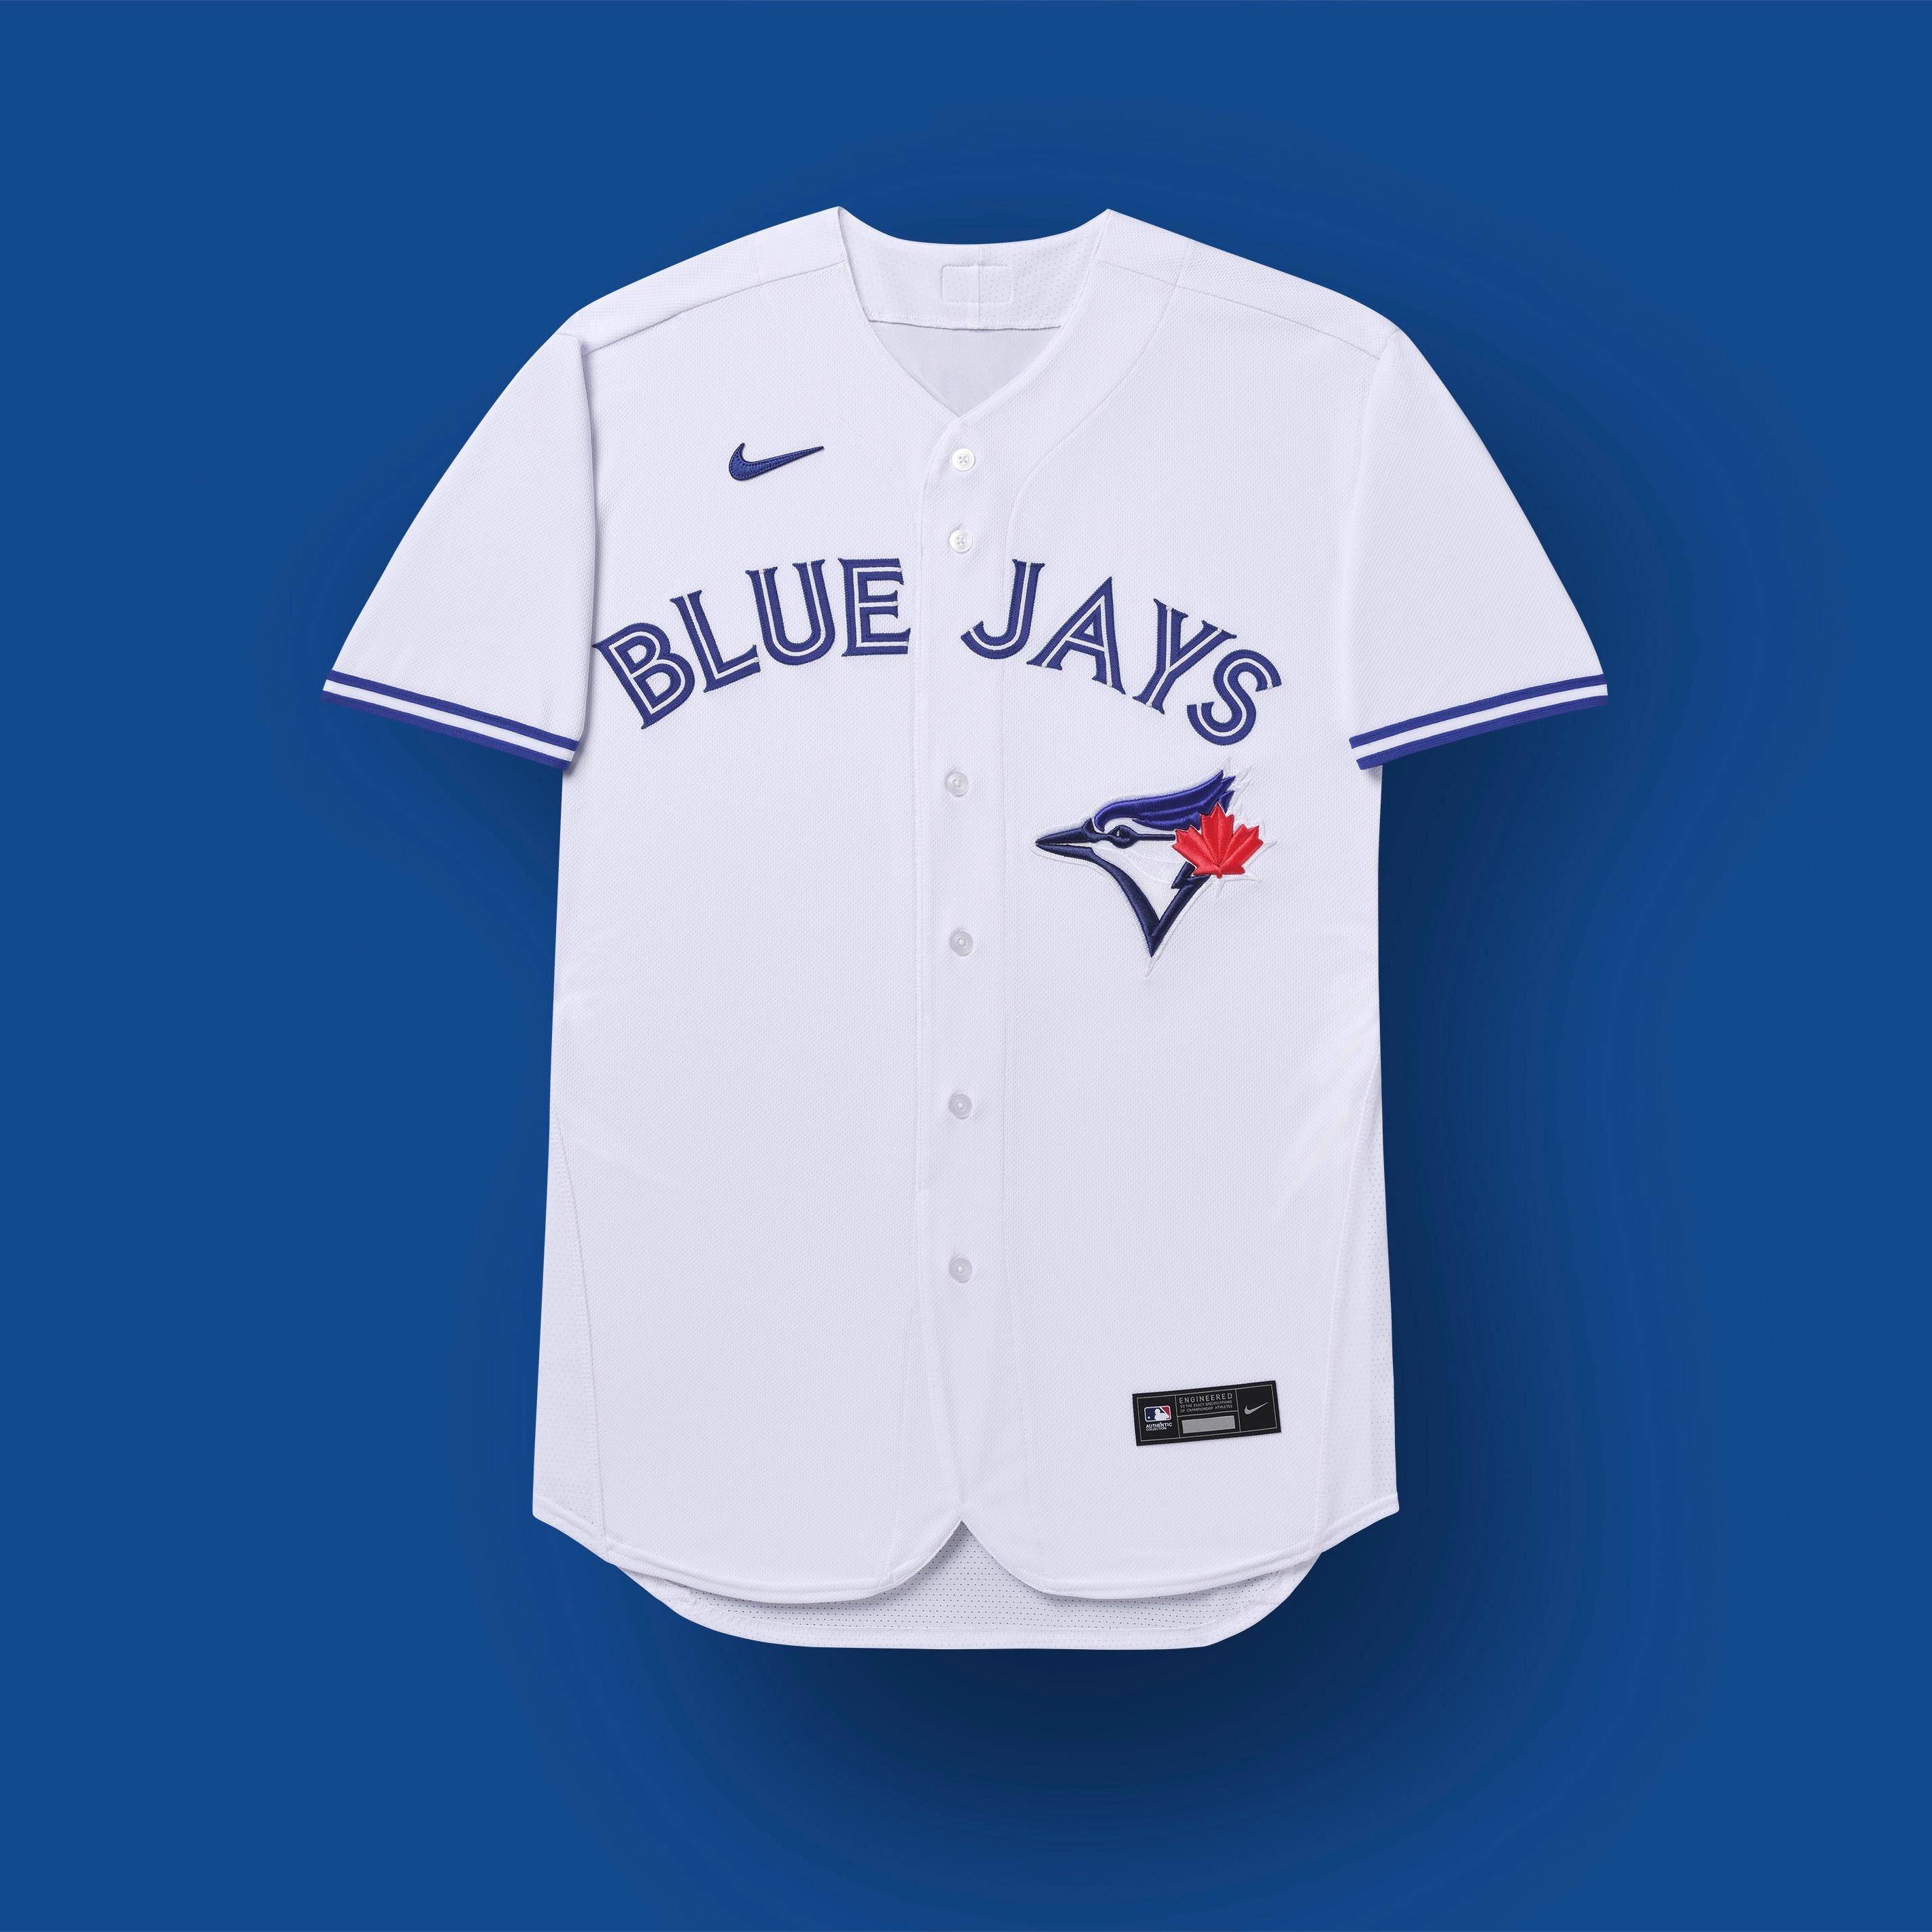 uniforme de toronto blue jays 2020